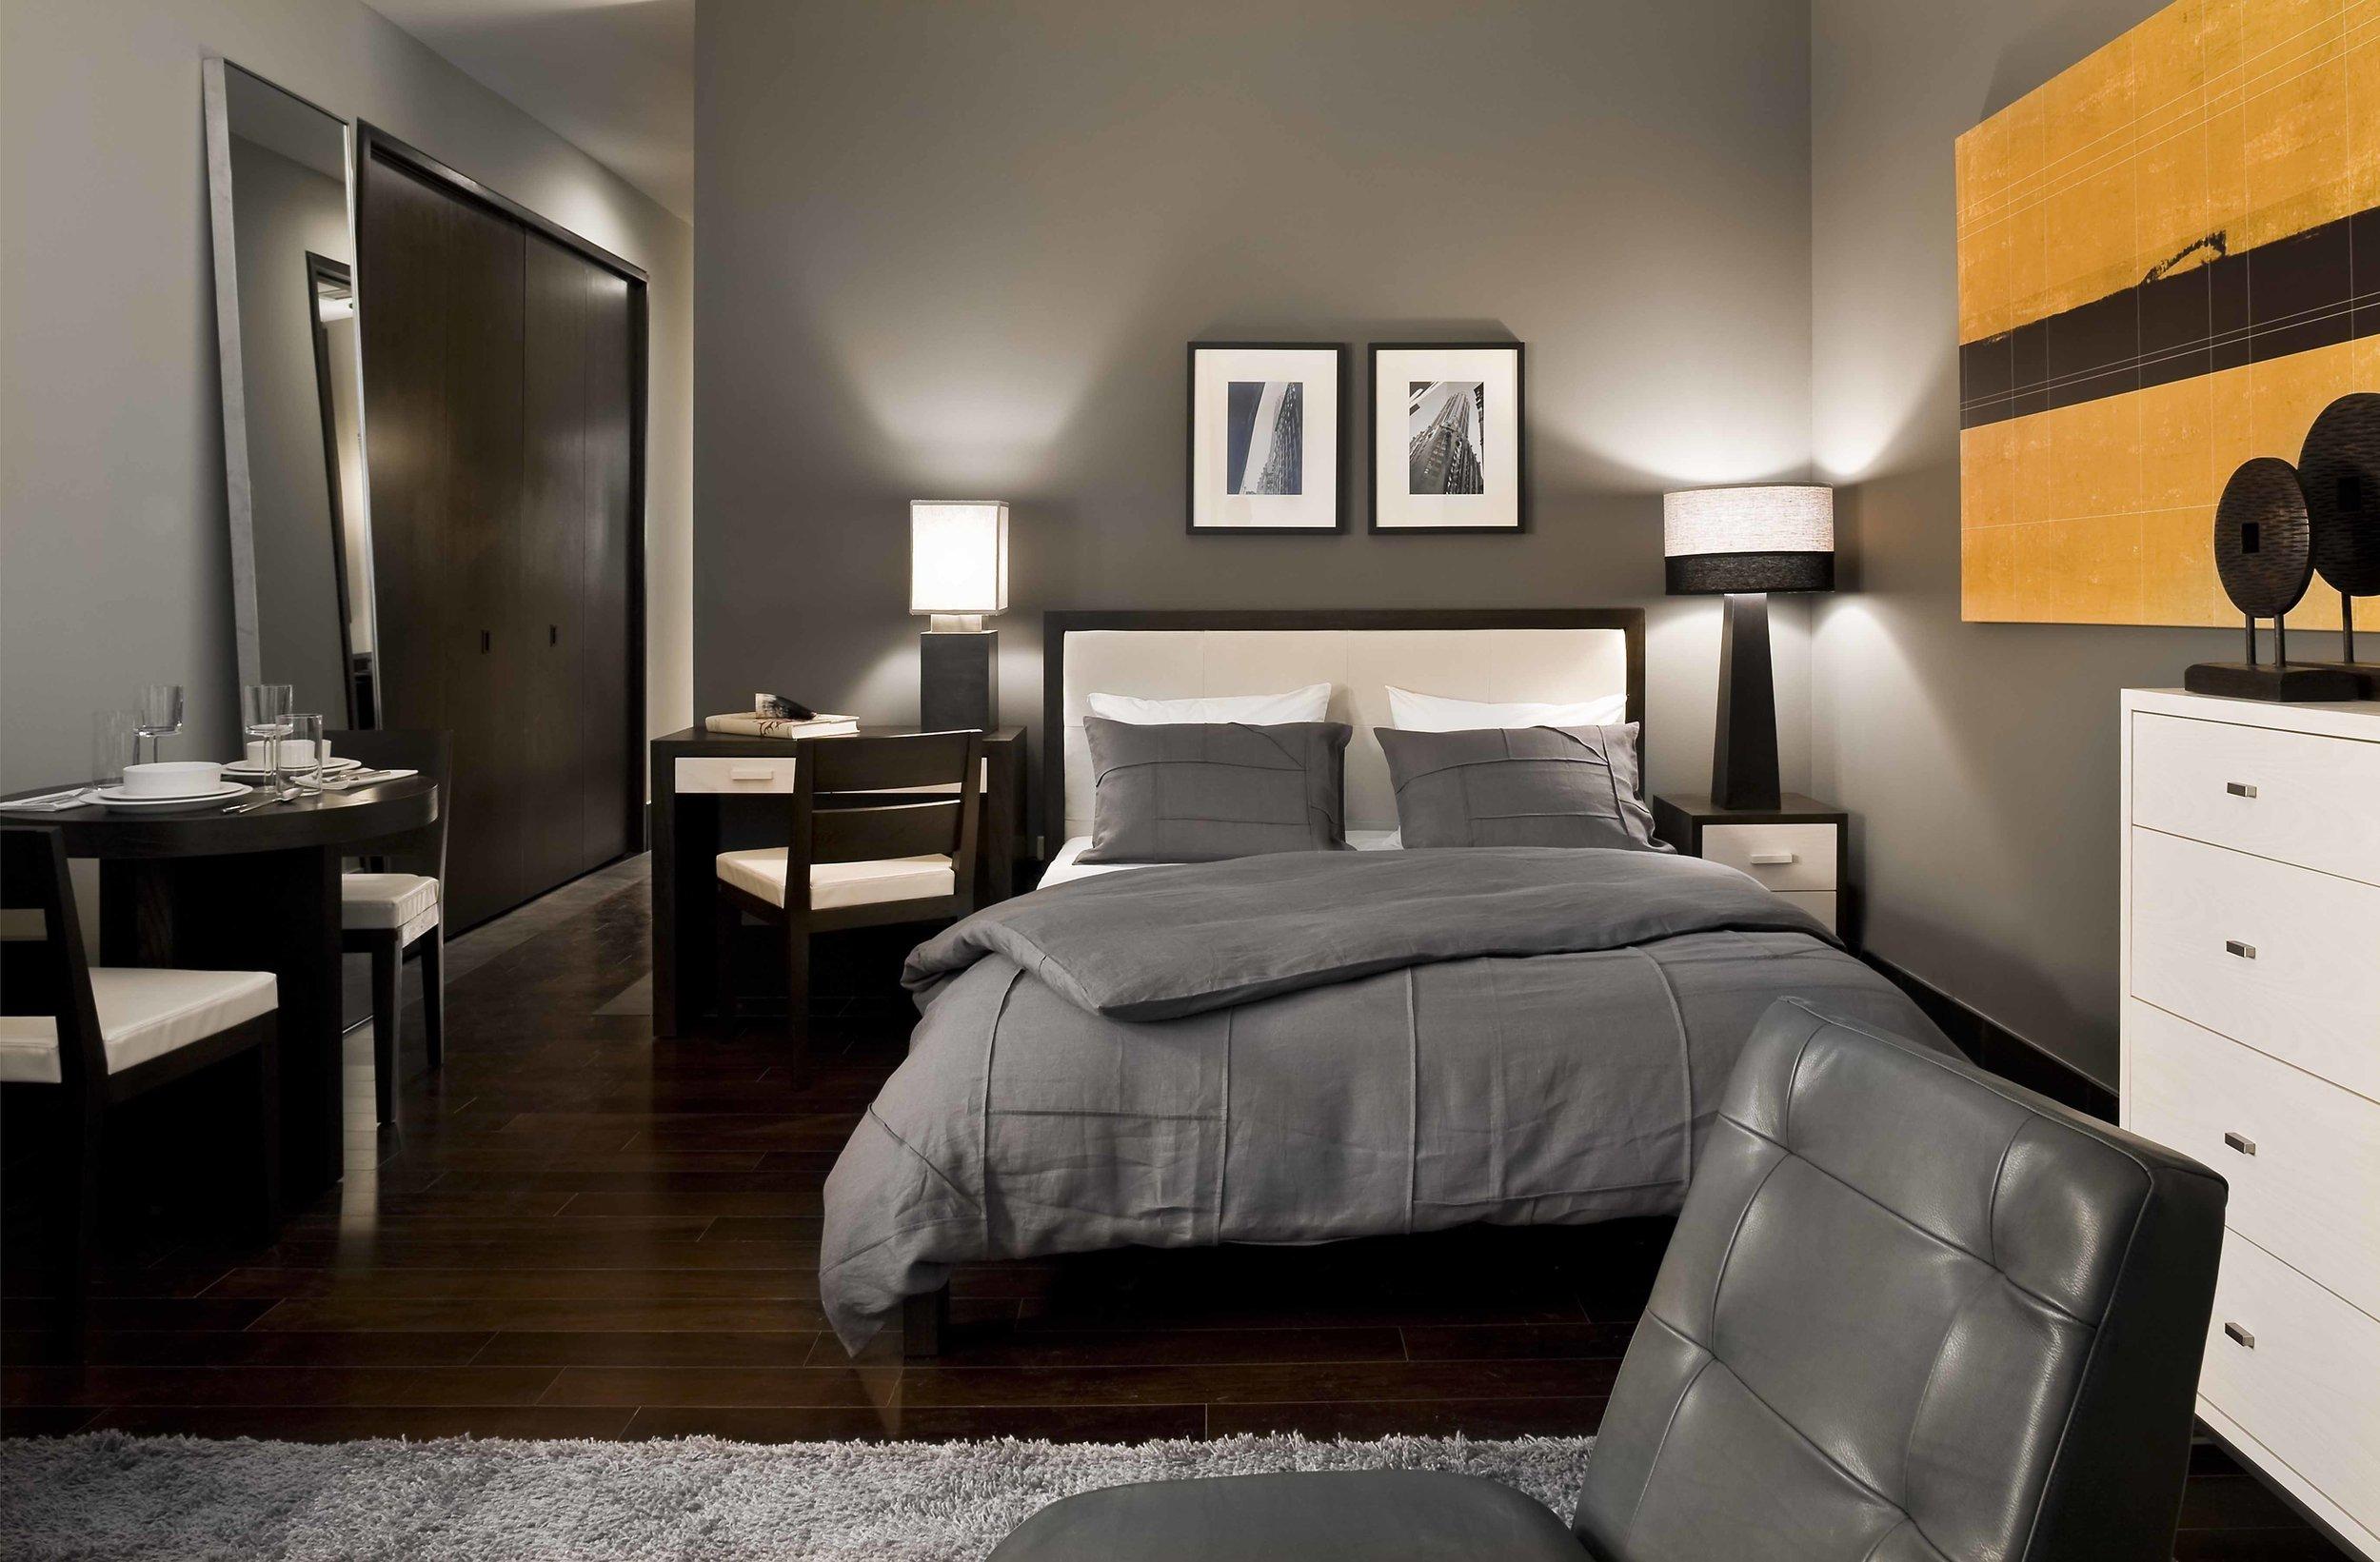 Chelsea Bed ,  Mercer Console ,  Nolita Chair ,  Arte 5 Drawer Dresser